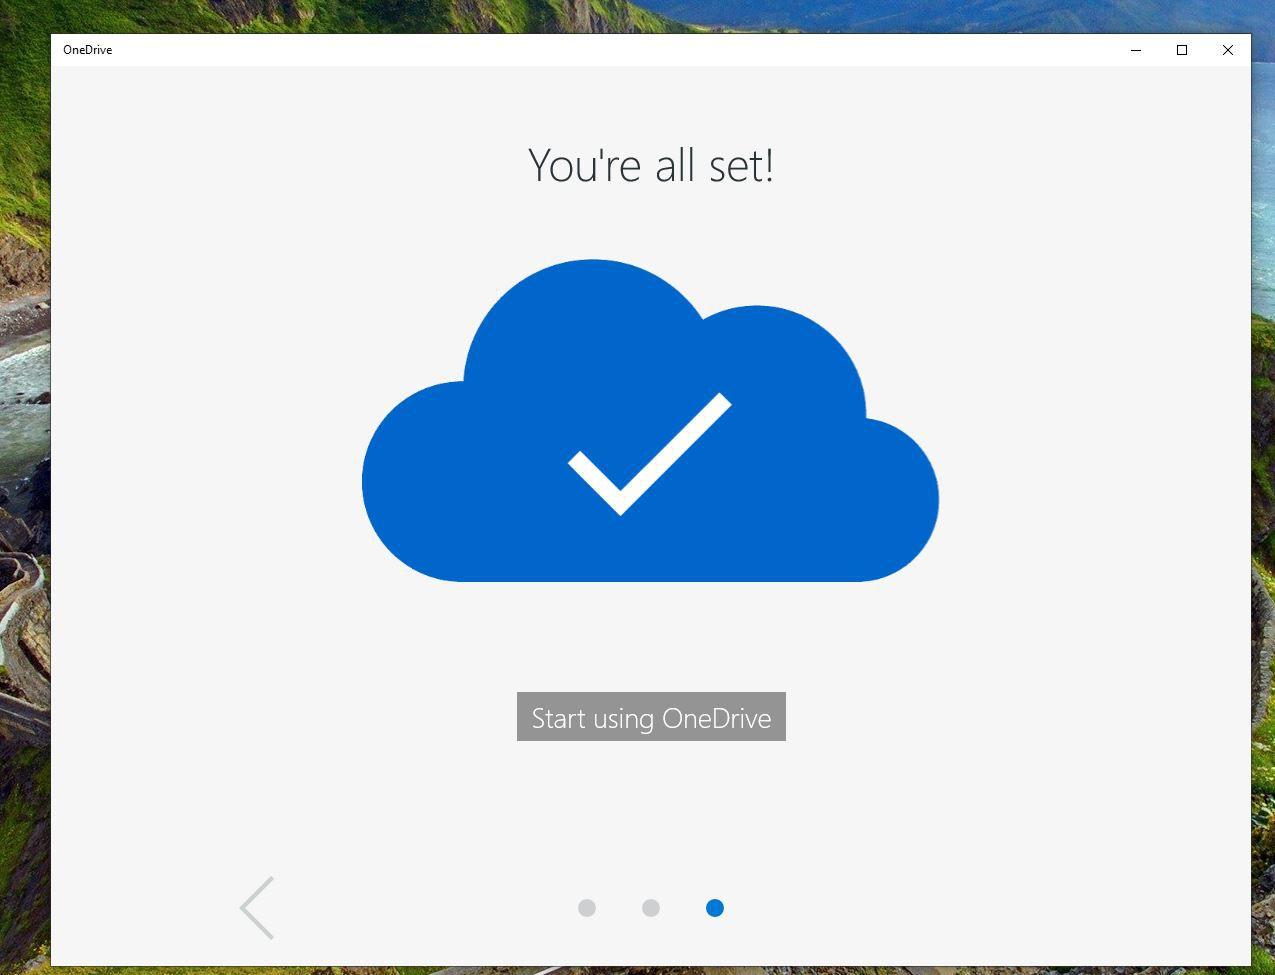 Screenshot of OneDrive app